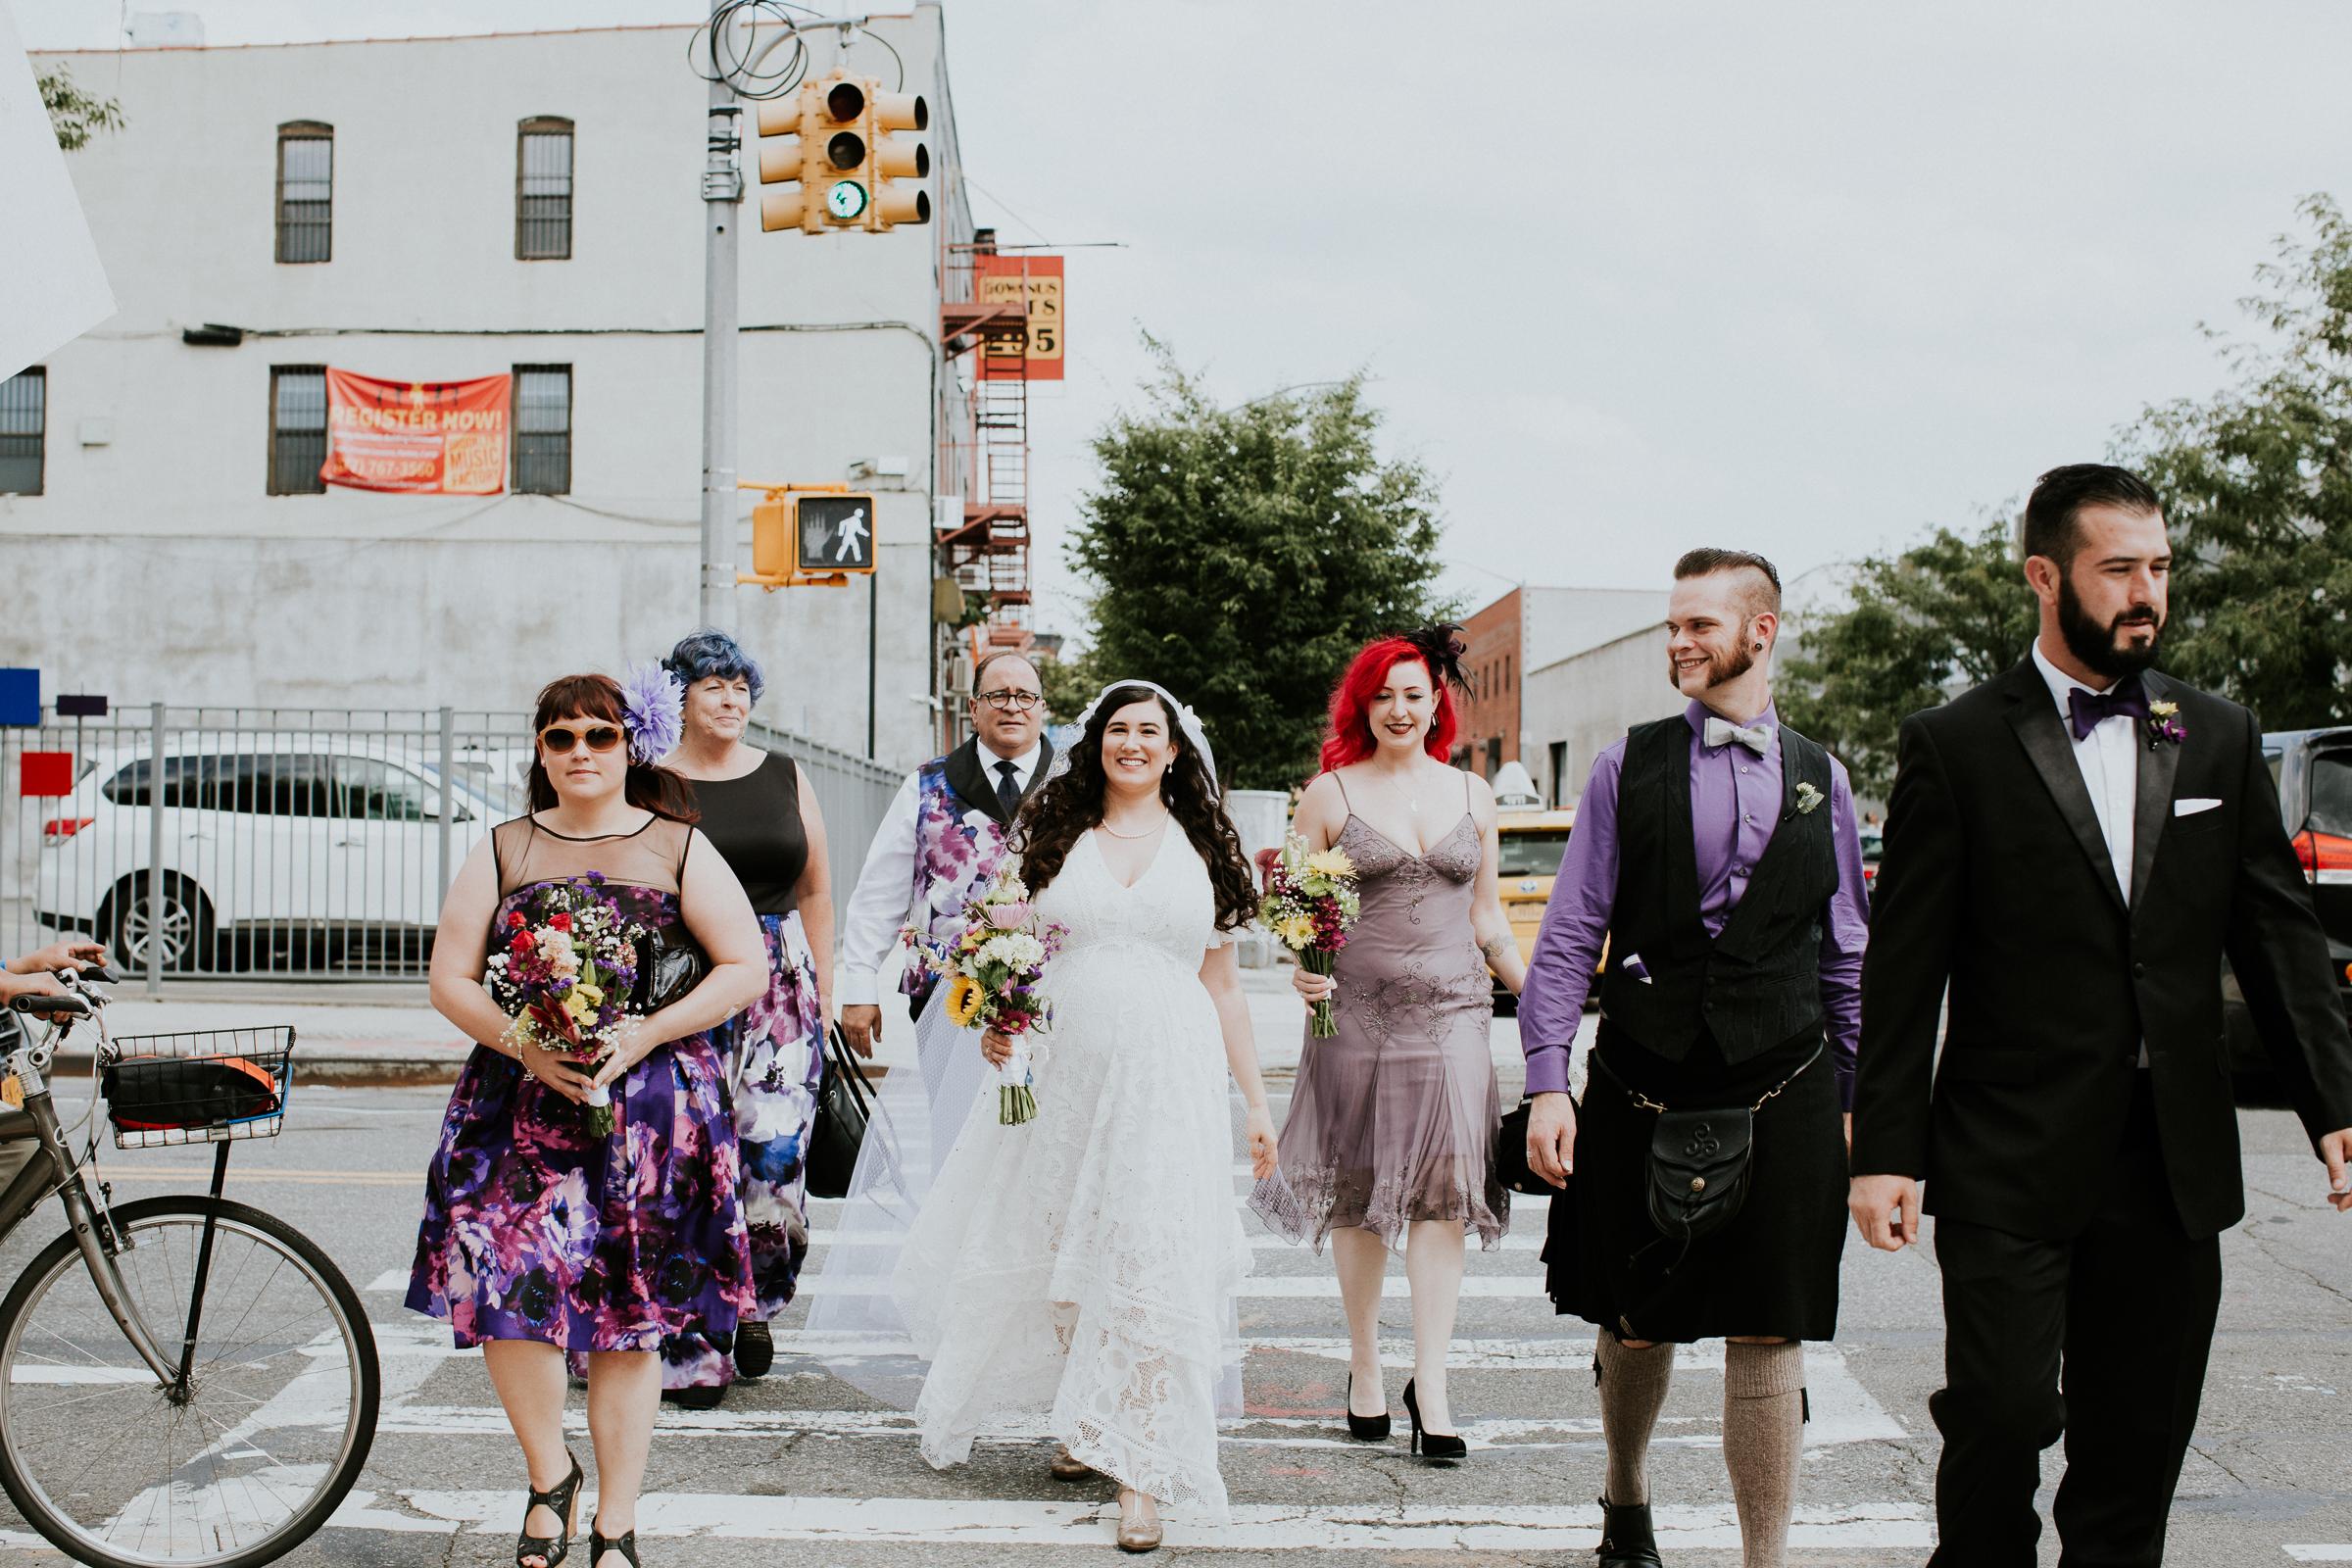 New-York-Documentary-Wedding-Photography-Best-Of-2017-by-Elvira-Kalviste-Photography-133.jpg